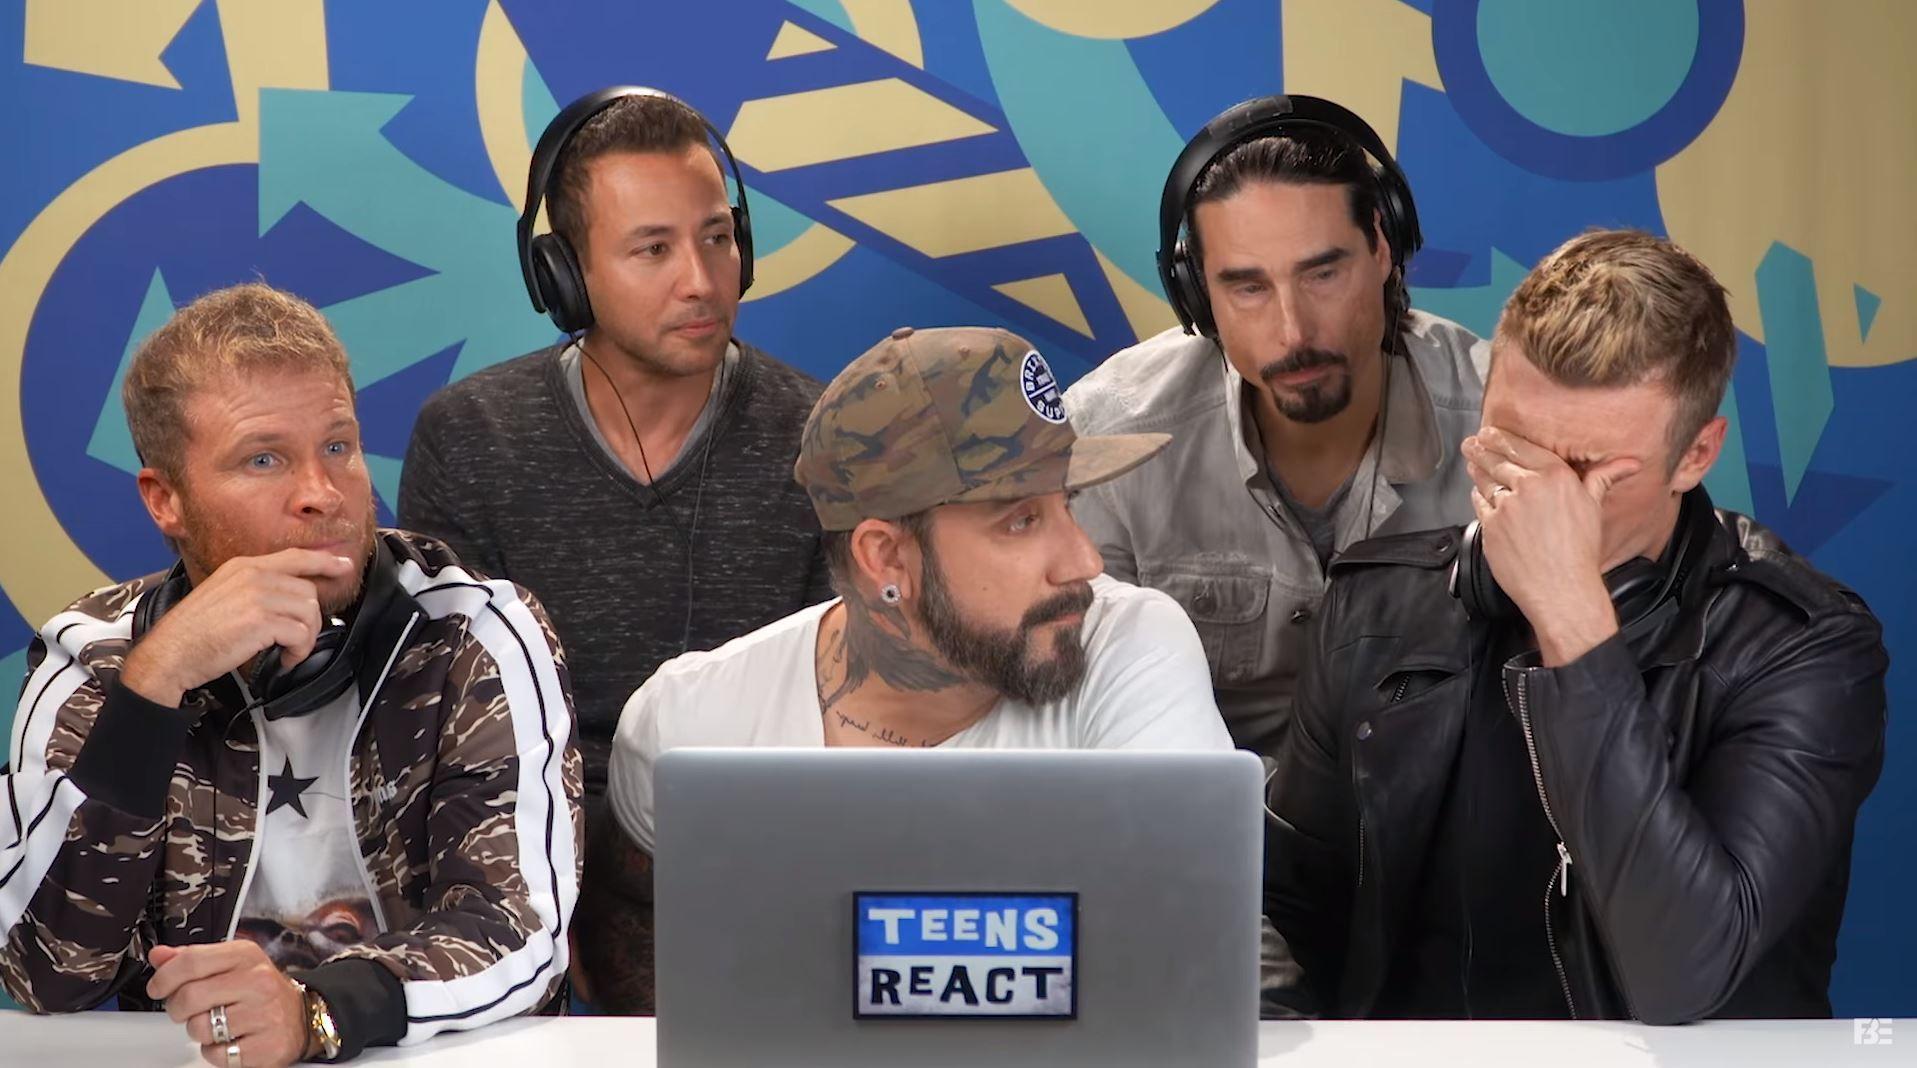 BSB React